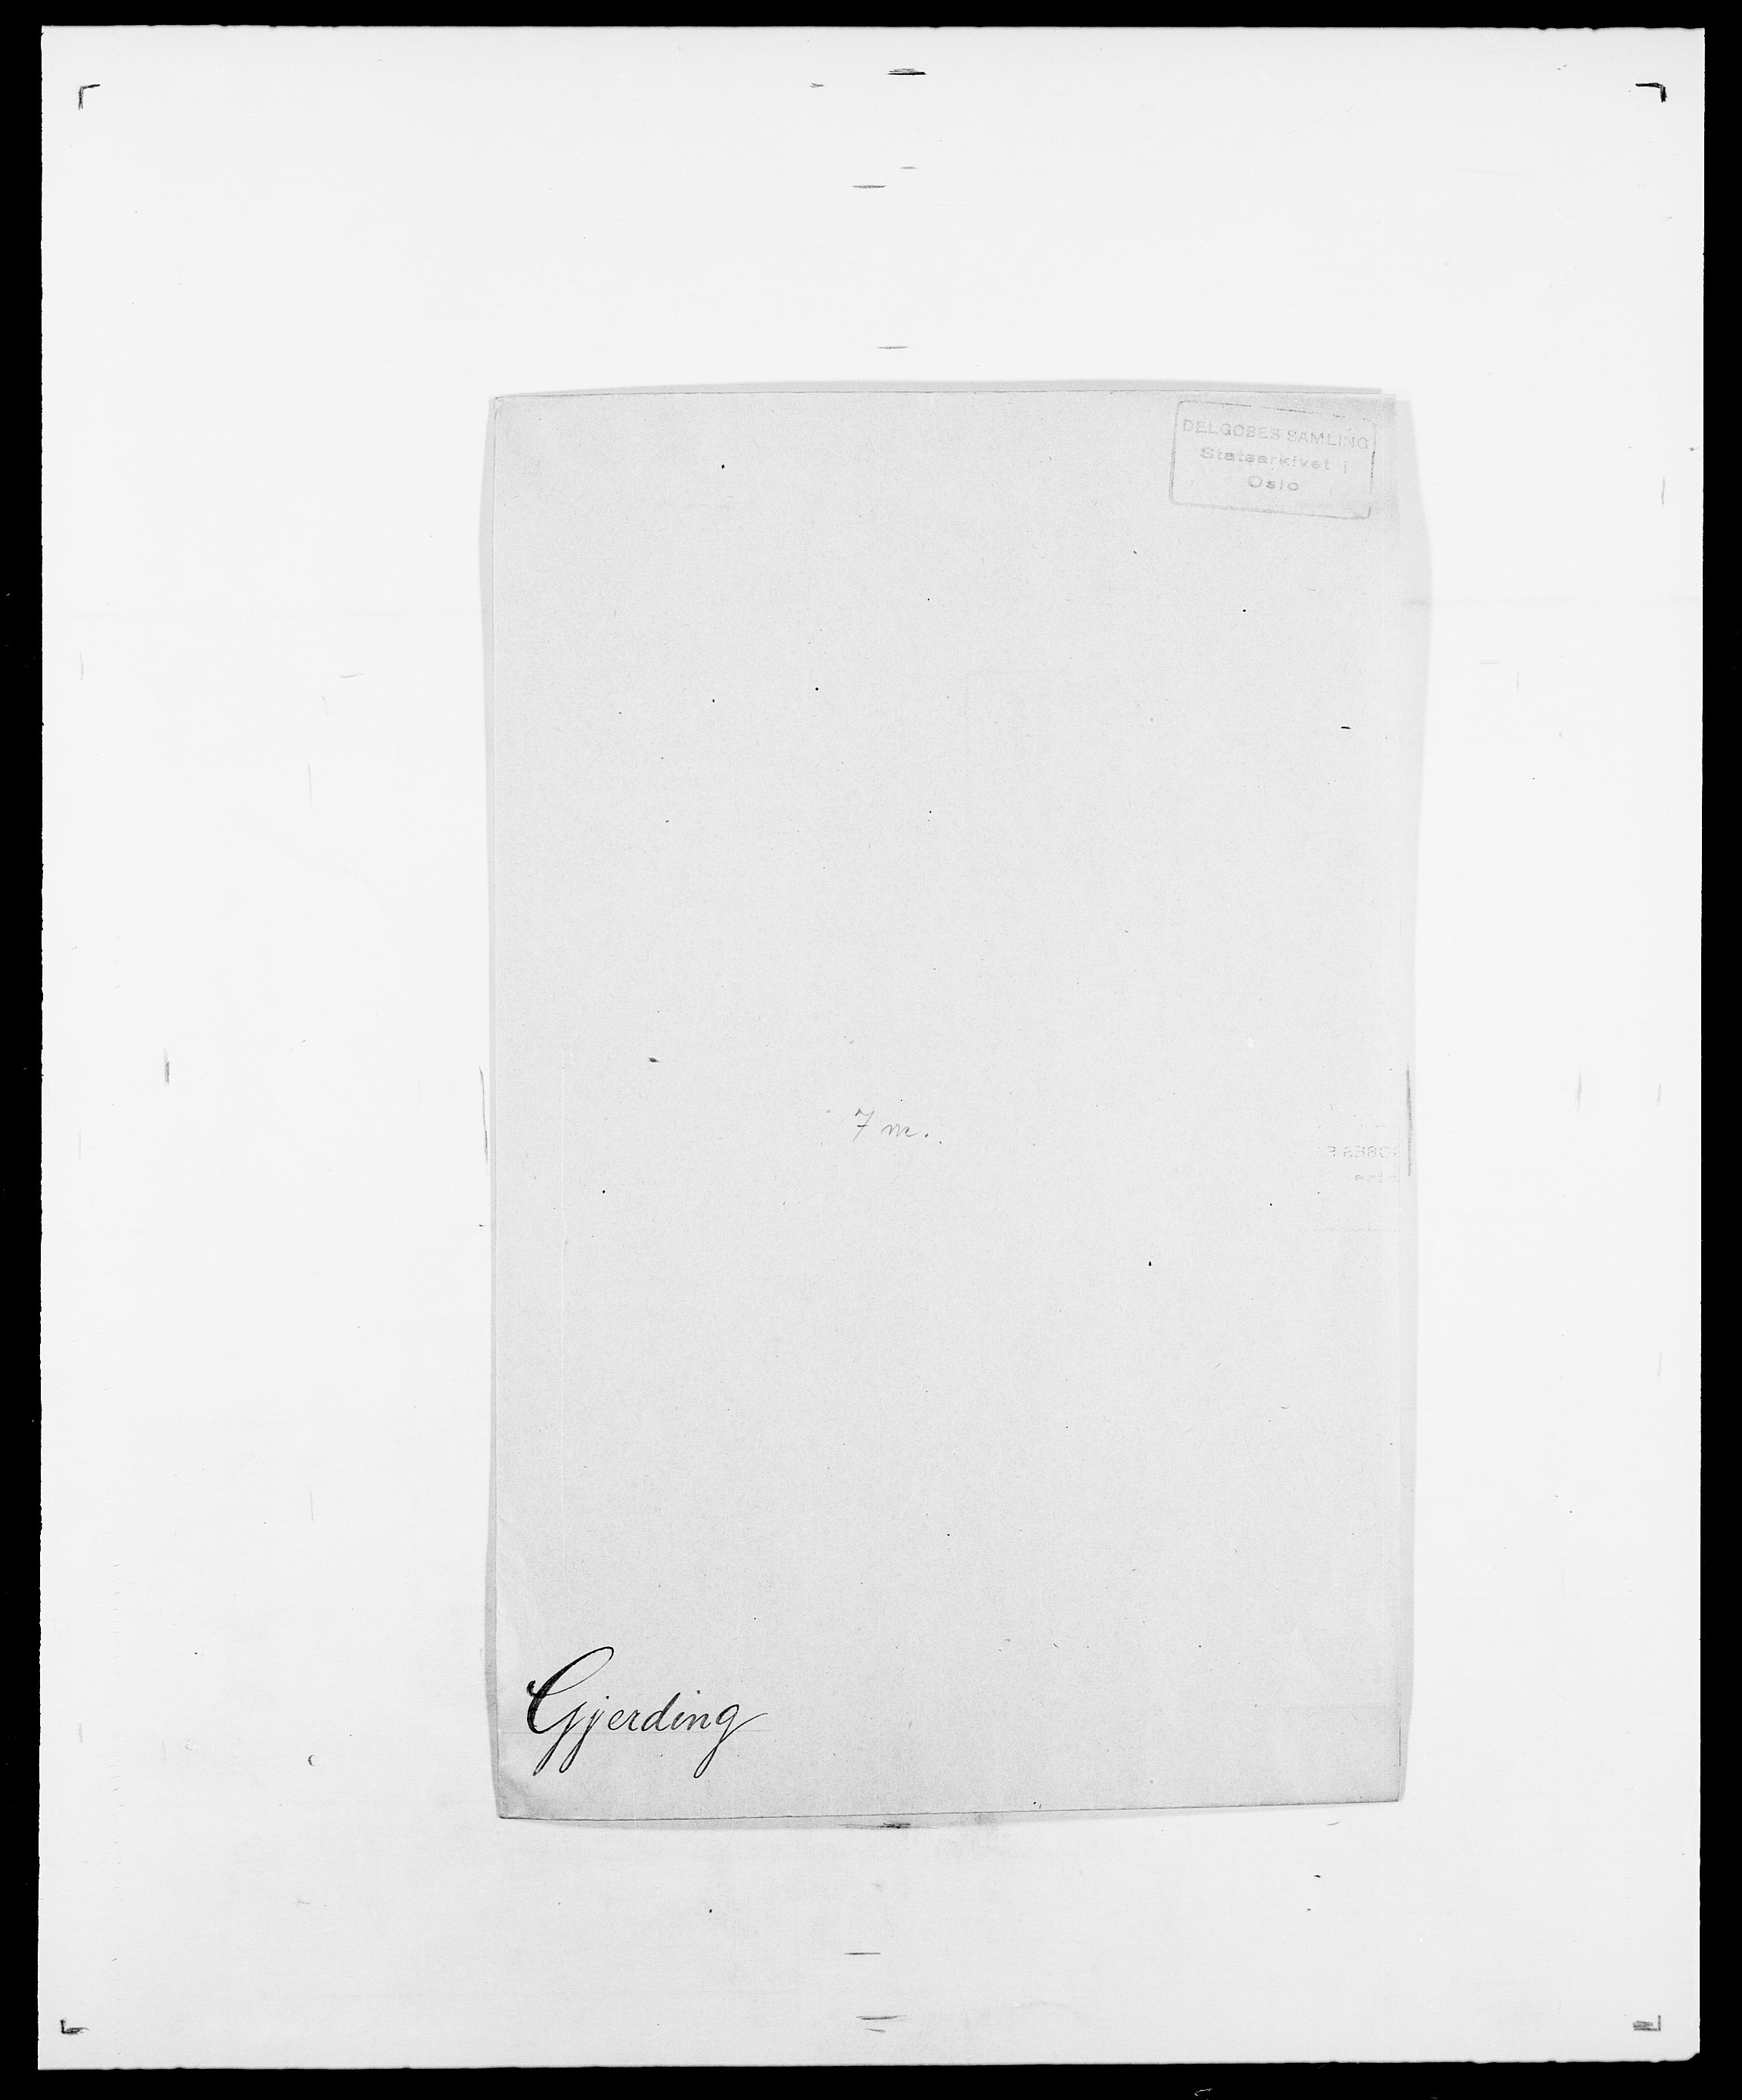 SAO, Delgobe, Charles Antoine - samling, D/Da/L0014: Giebdhausen - Grip, s. 107